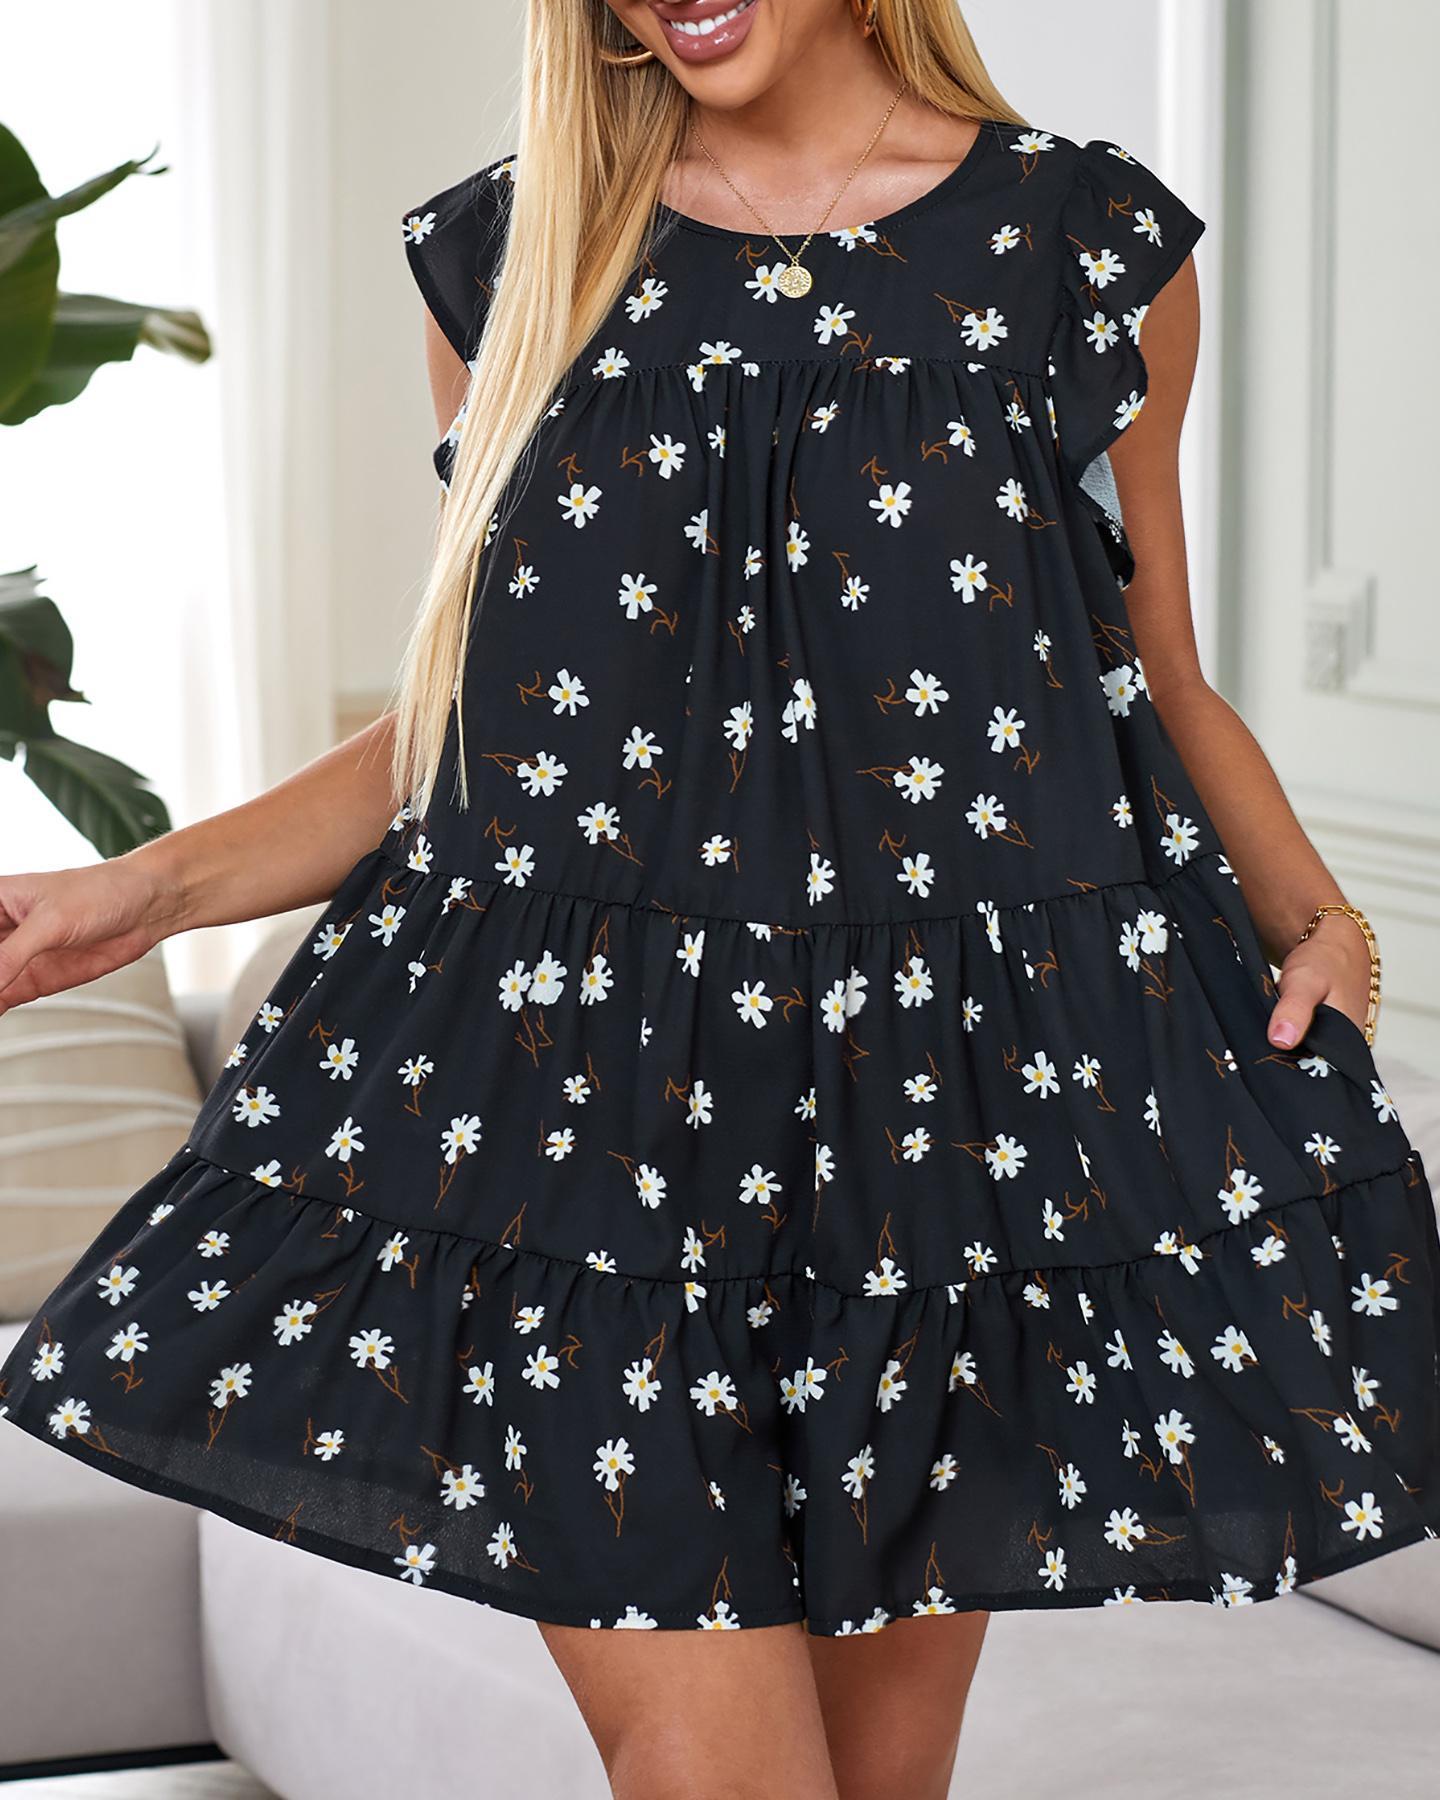 Daisy Print Ruffles Sleeve Casual Dress thumbnail